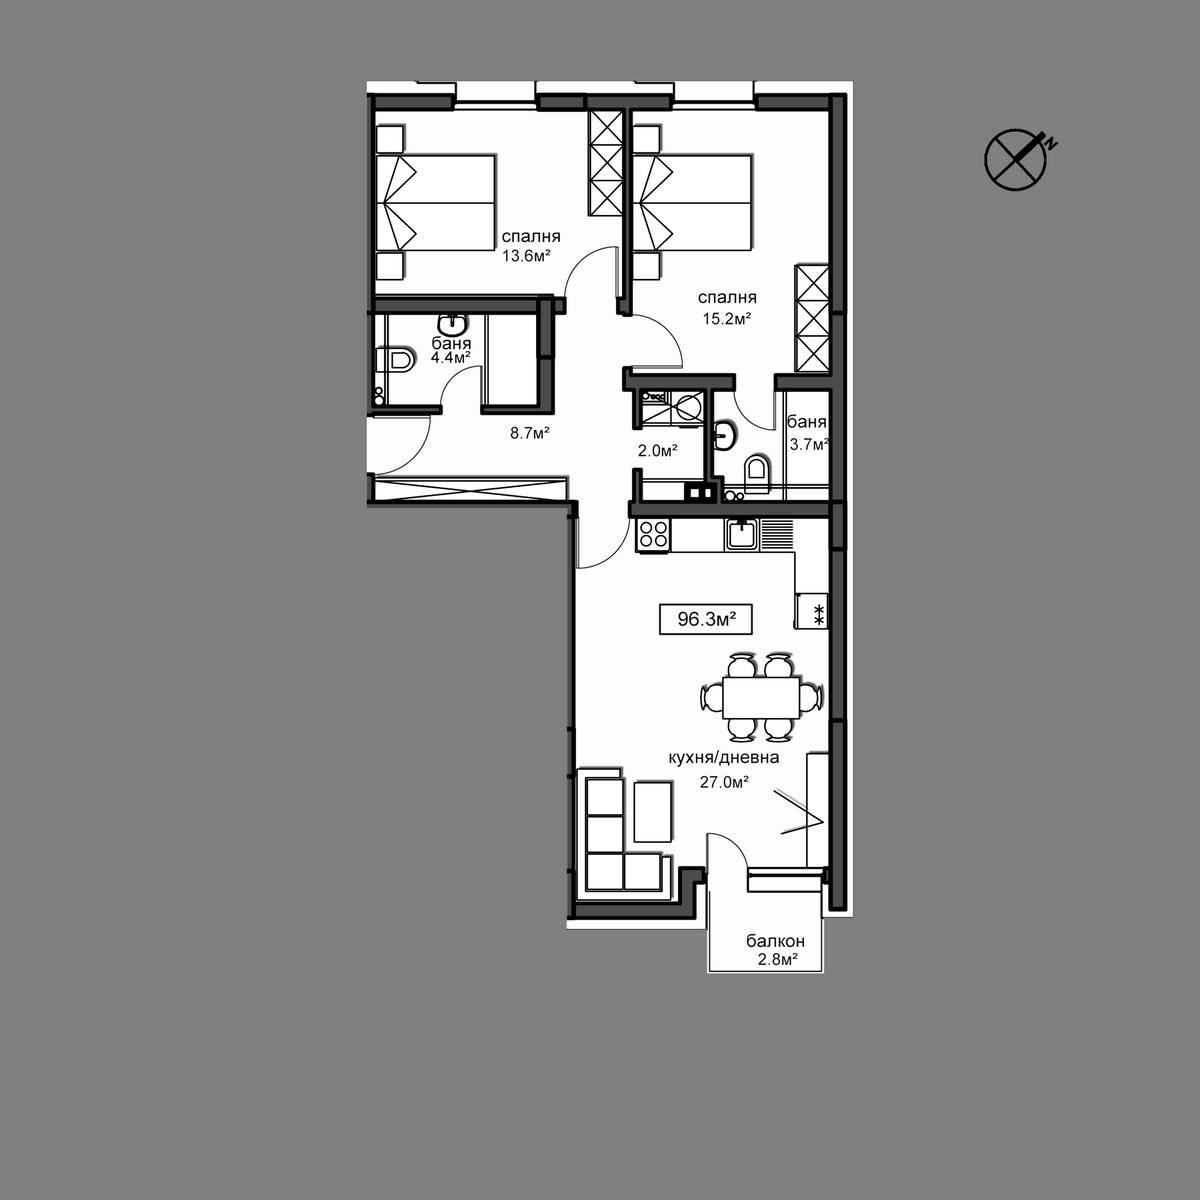 Продава апартамент - Апартамент  Б9